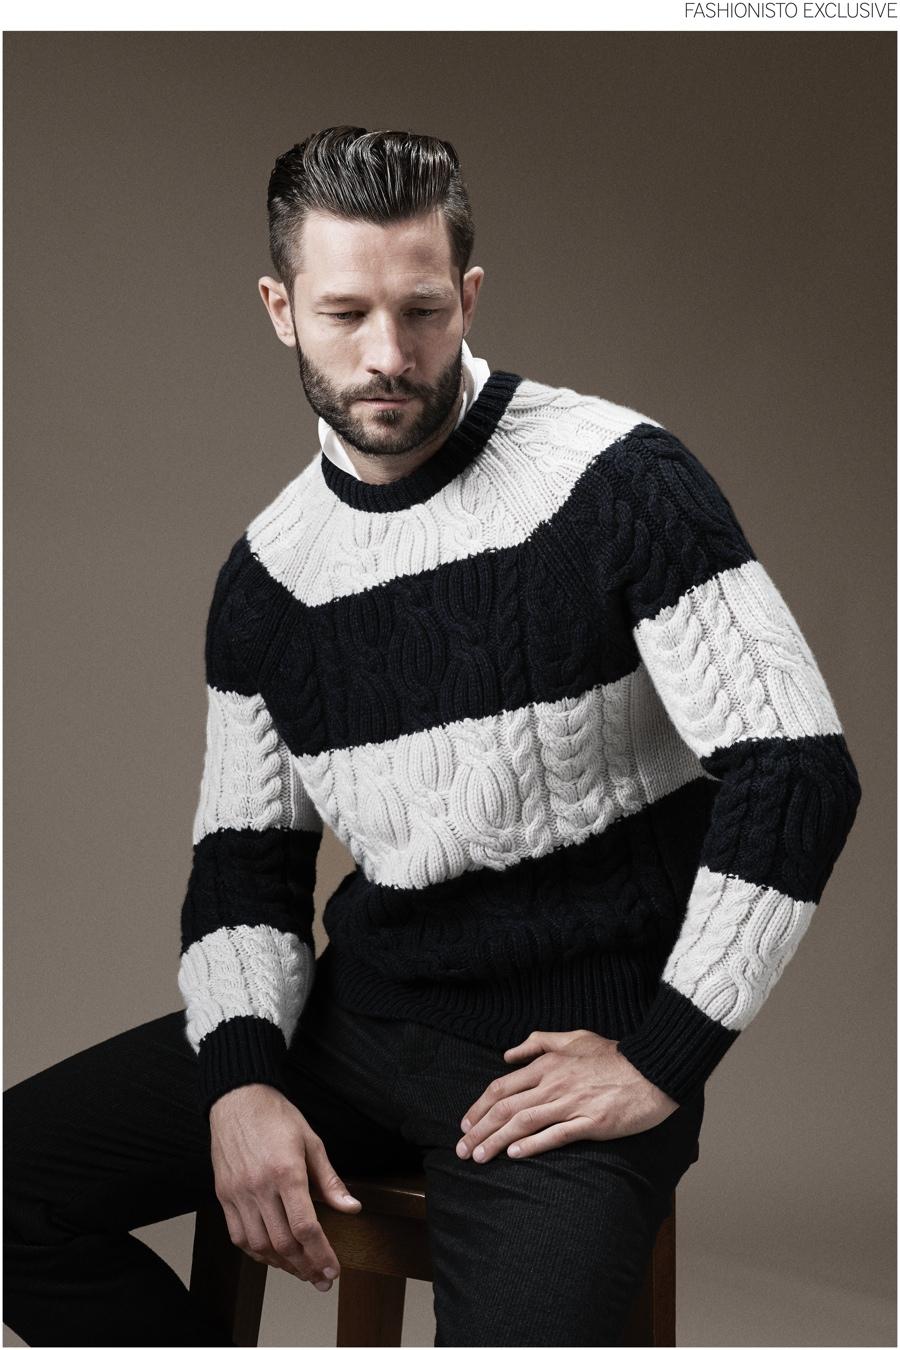 Fashionisto Exclusive: John Halls by Ben Harries